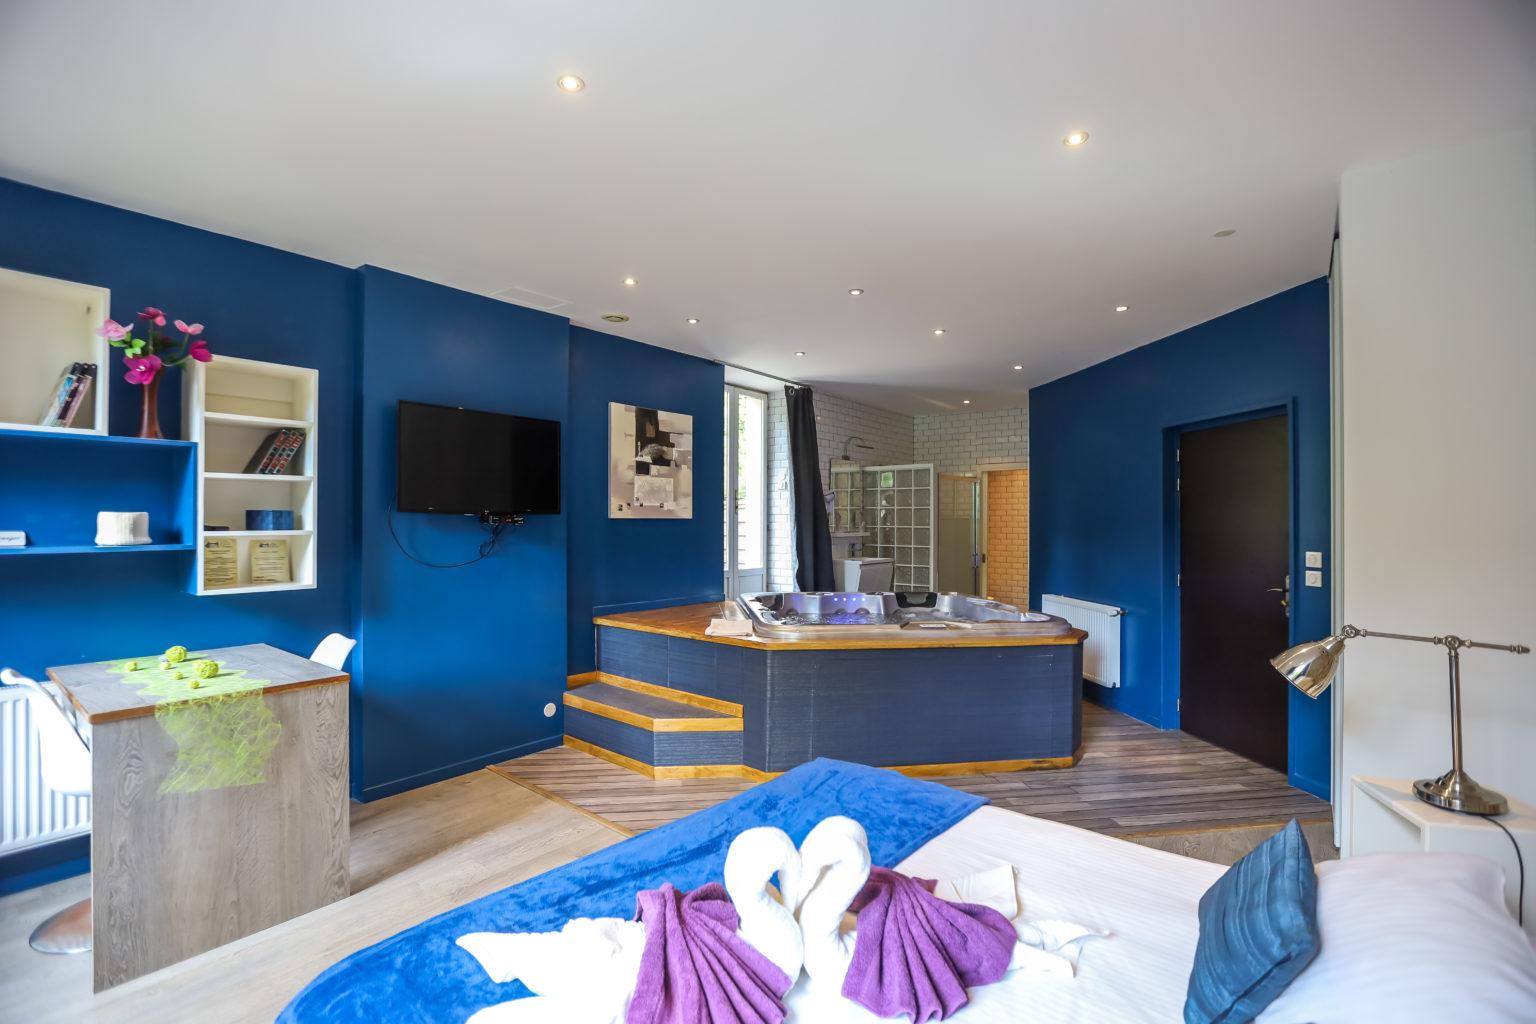 CHAMBRE LA FONTVINEUSE IMG_1607LA FONT VINEUSE HOTEL & SPA